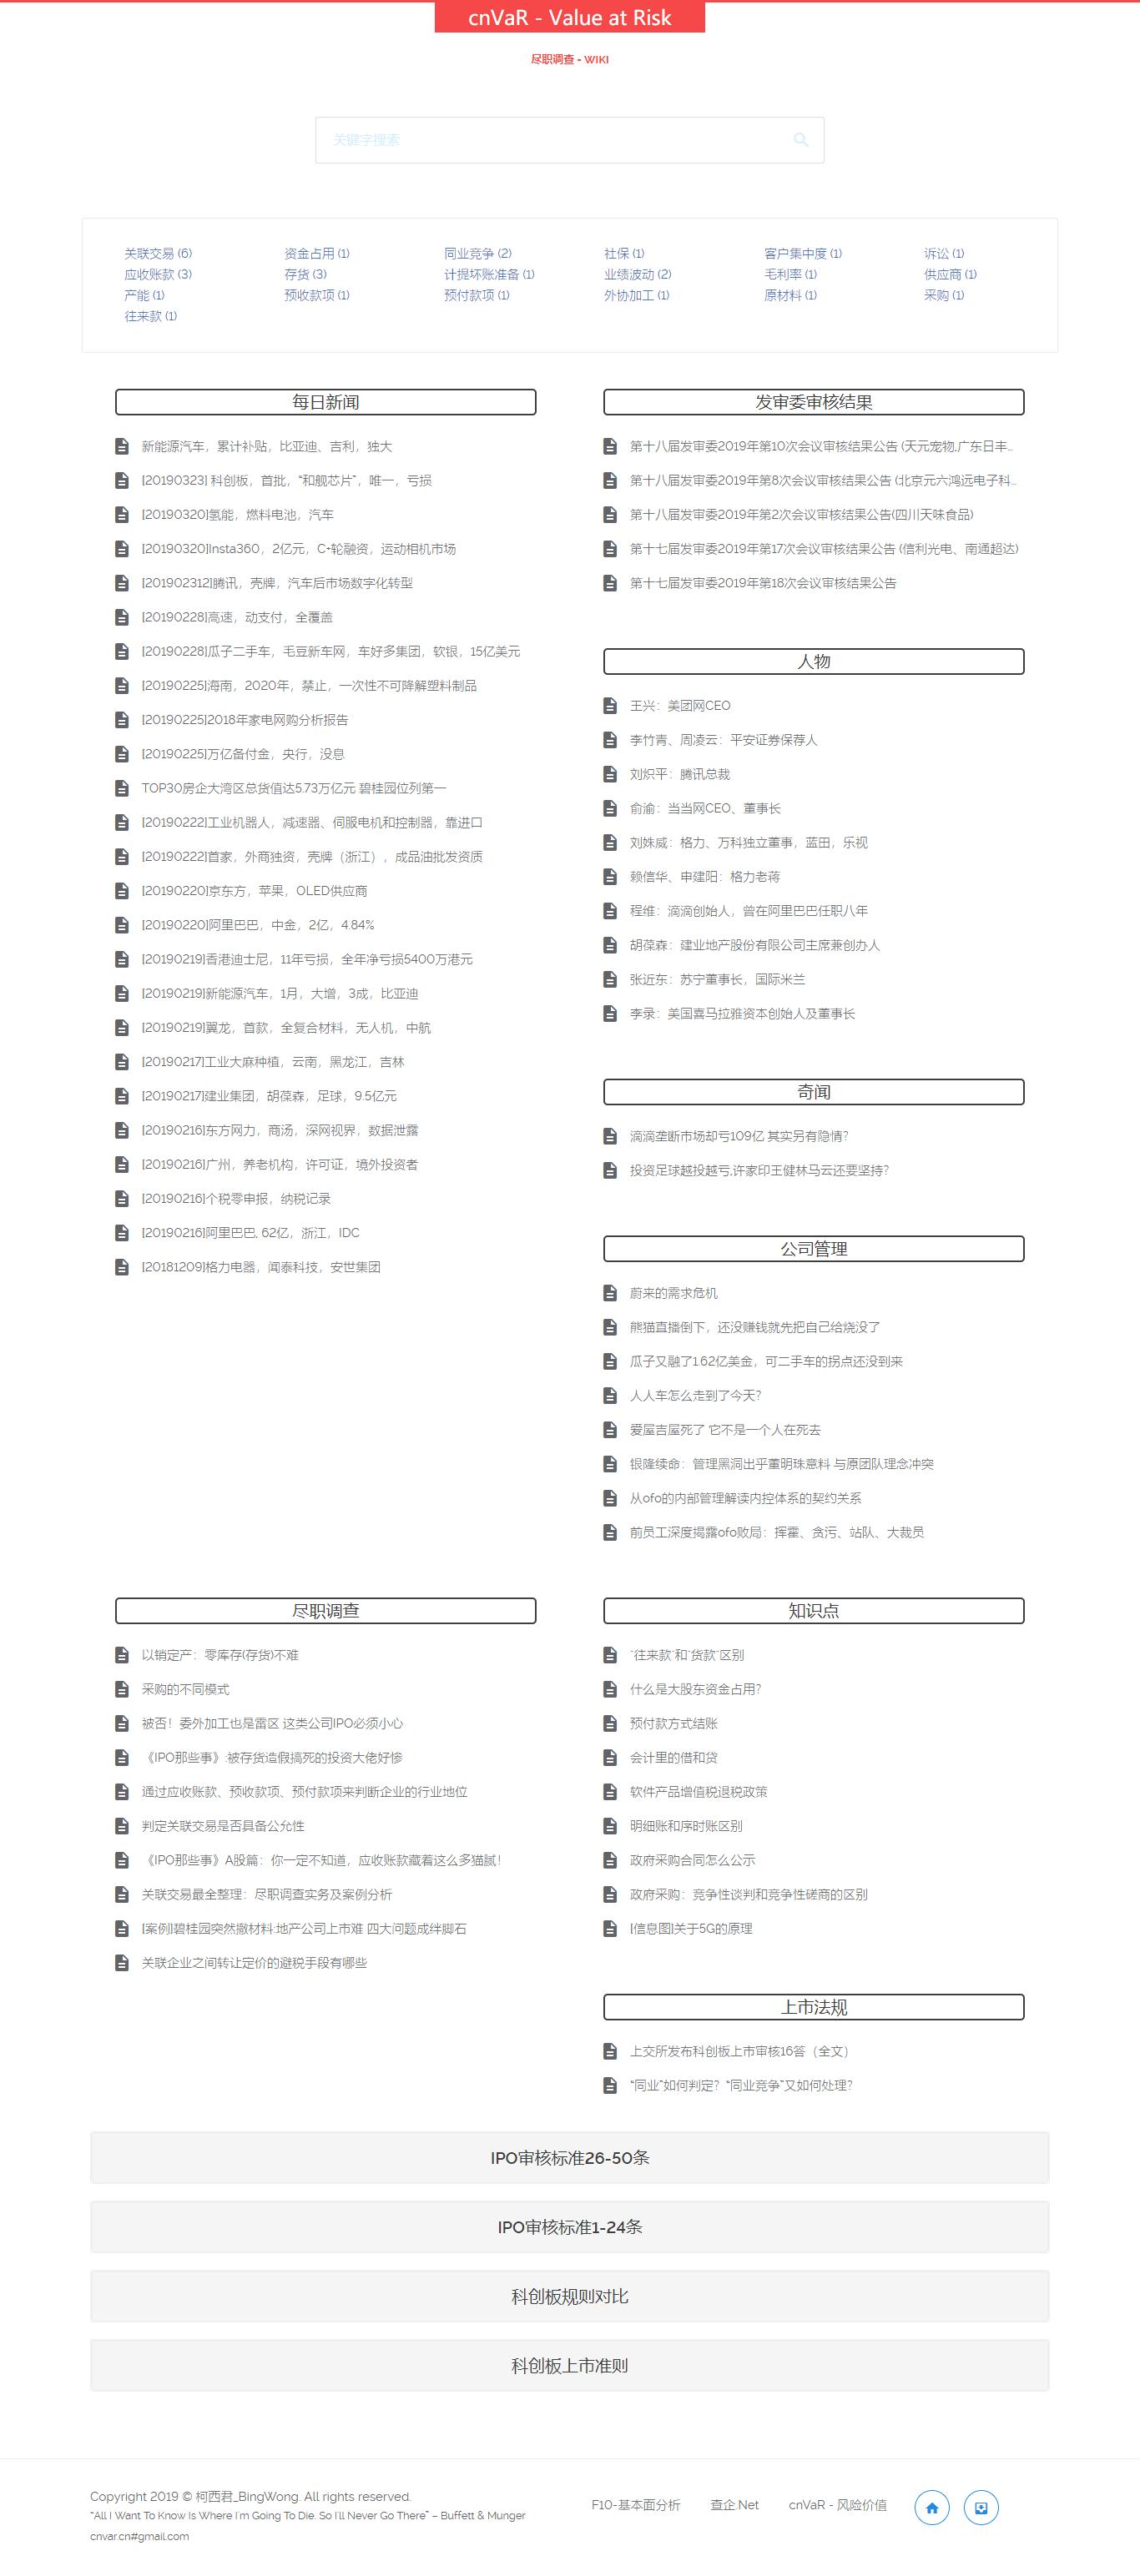 Typecho 日志记录型博客主题 CnvarWiki